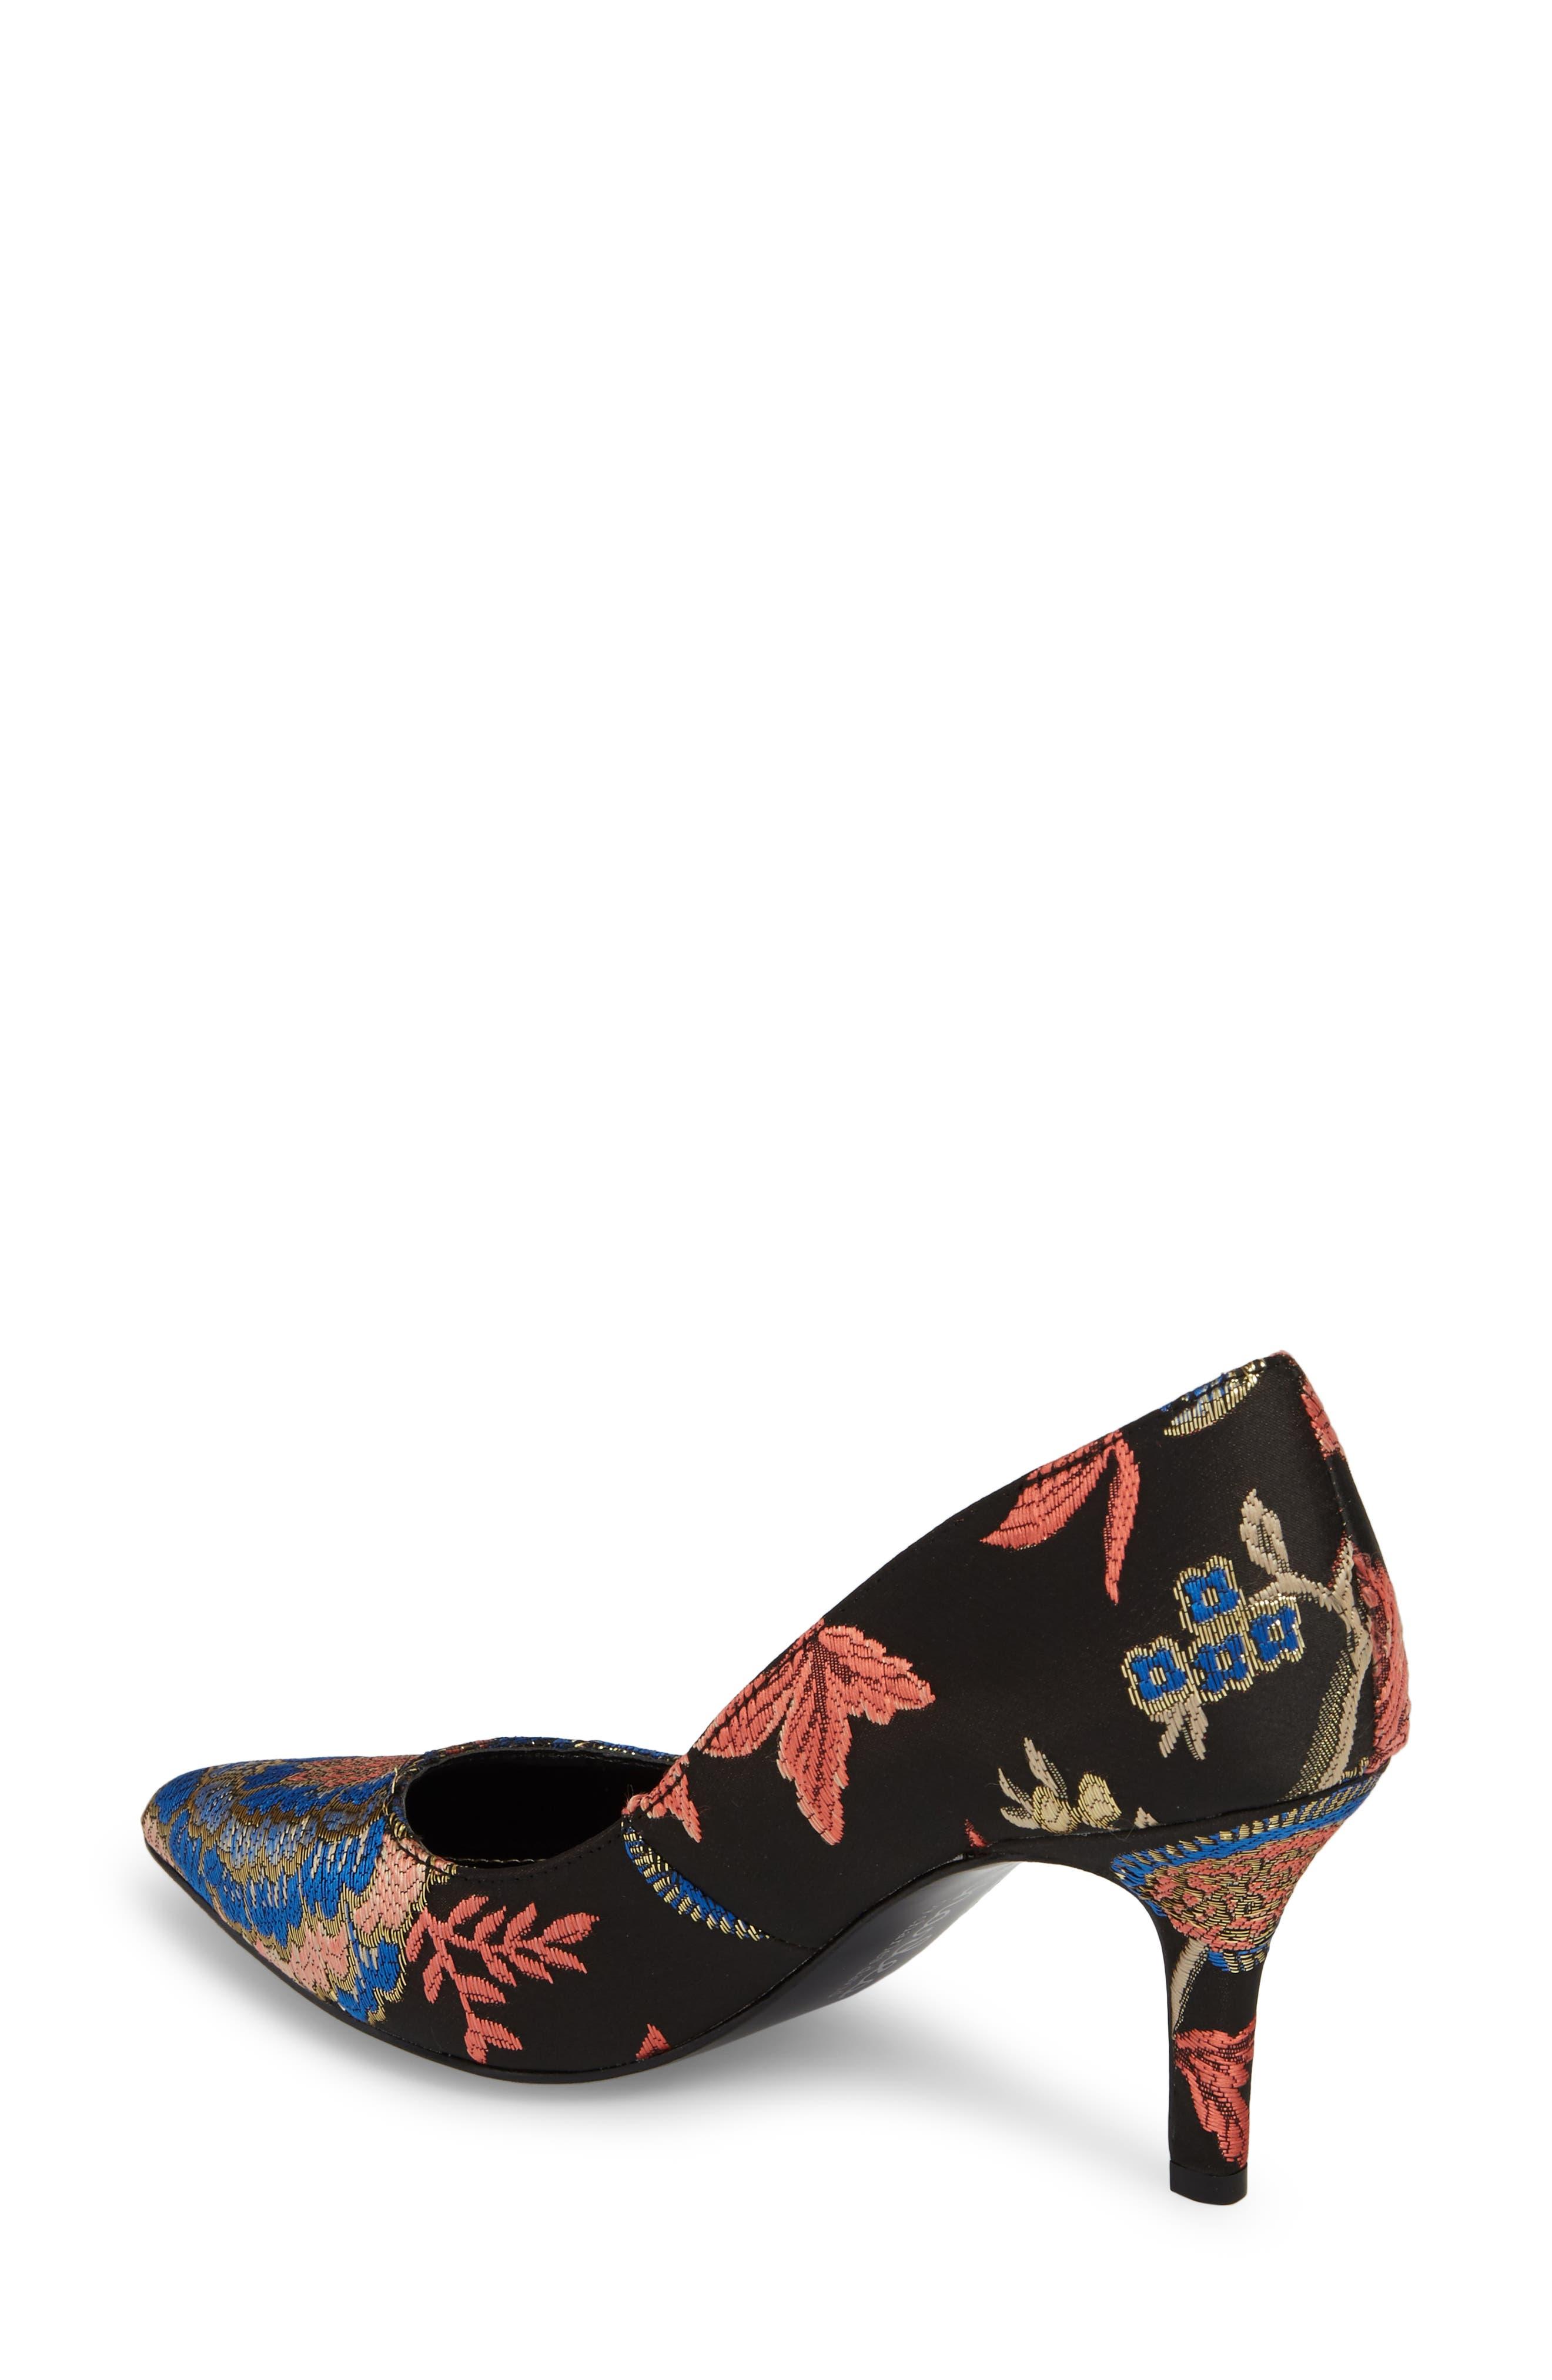 'Sasha' Pointy Toe Pump,                             Alternate thumbnail 2, color,                             Black Floral Print Fabric